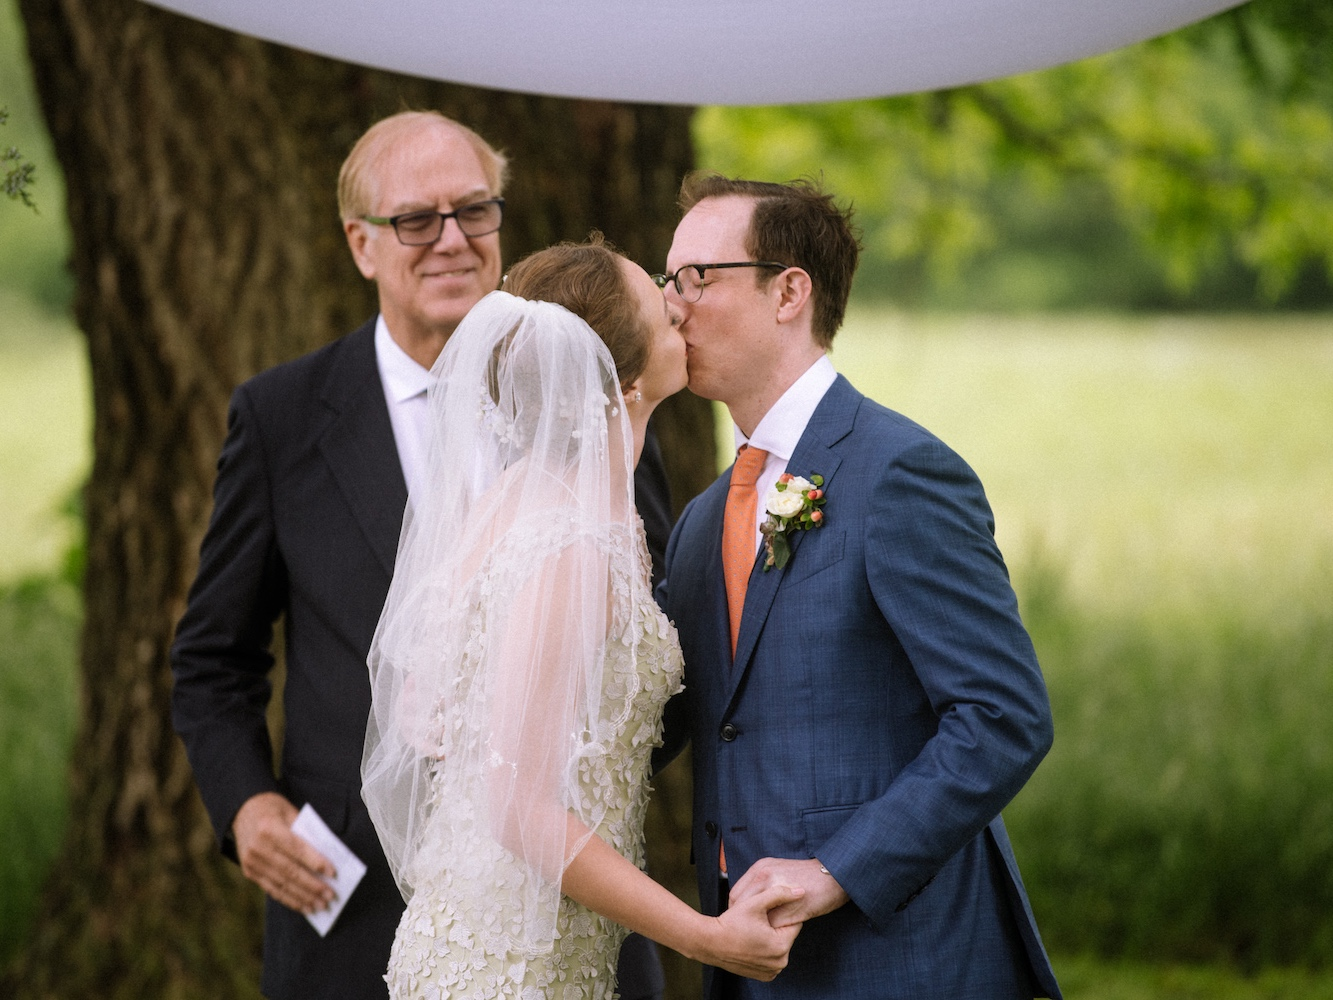 Oklahoma+City+Wedding+Photographer+Package115.jpg